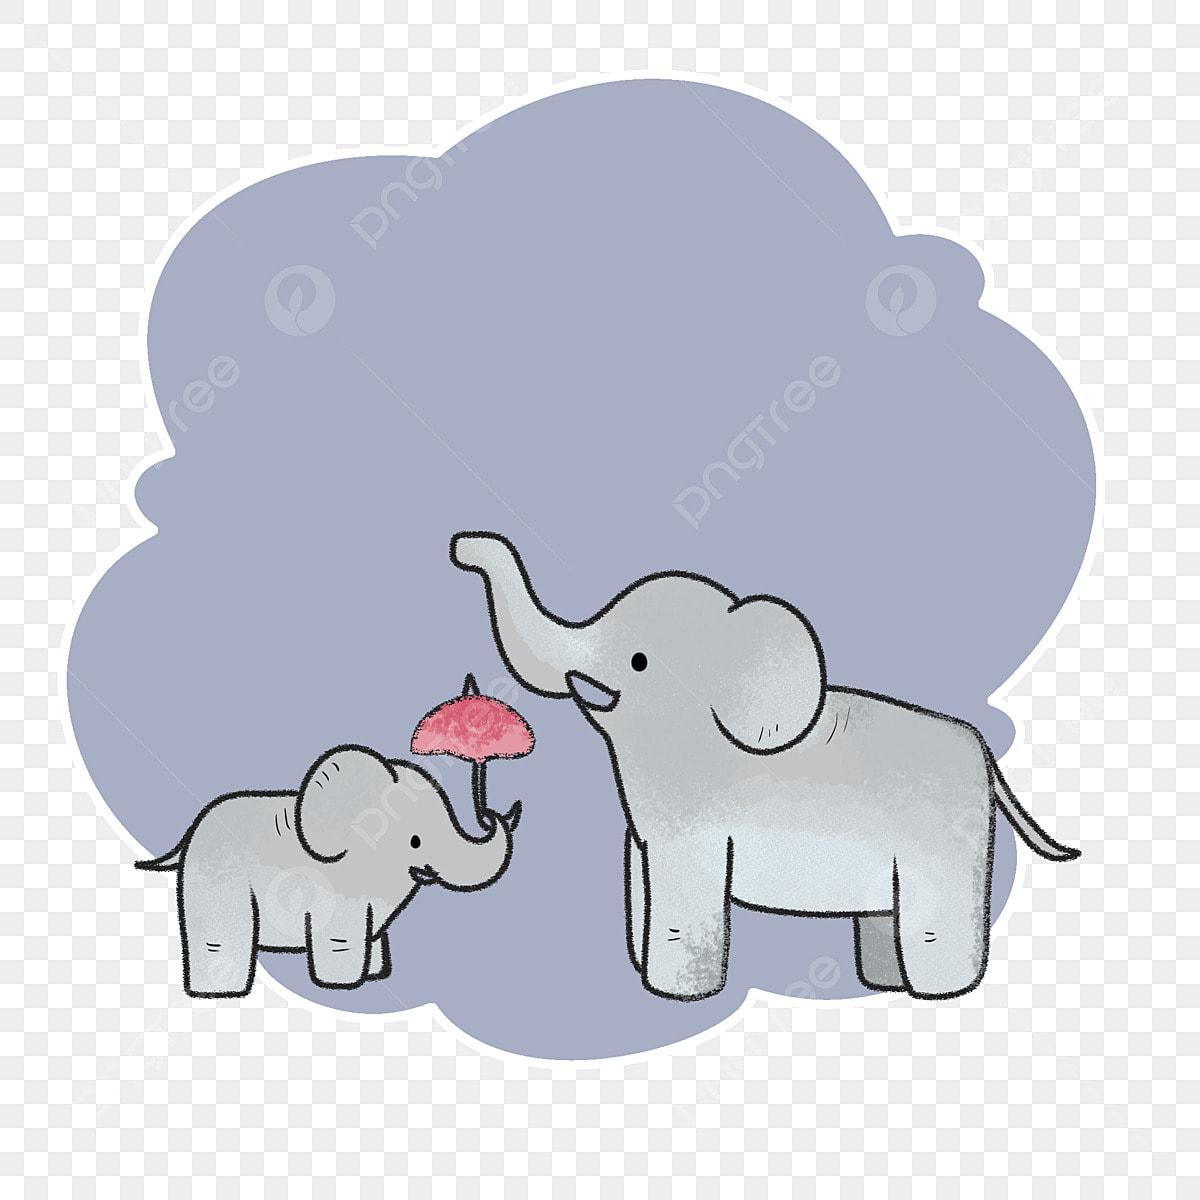 Elephant Clip Art - Royalty Free - GoGraph